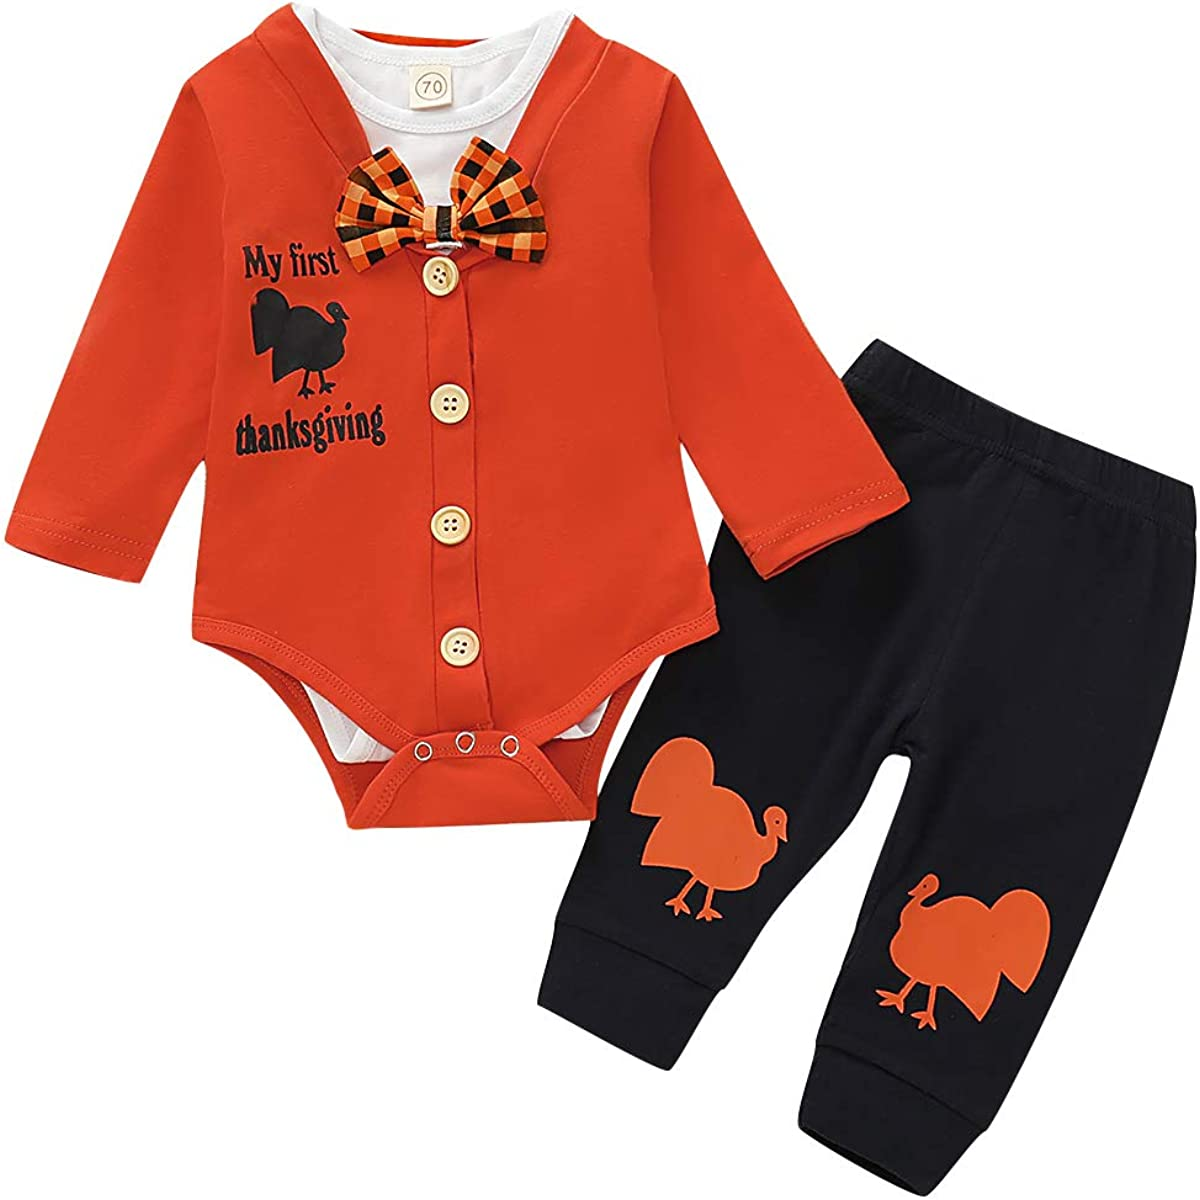 Aweyoo Baby Boy First Thanksgiving Outfit Turkey Printed Long Sleeve Romper Bodysuit Pants Set 3PCS